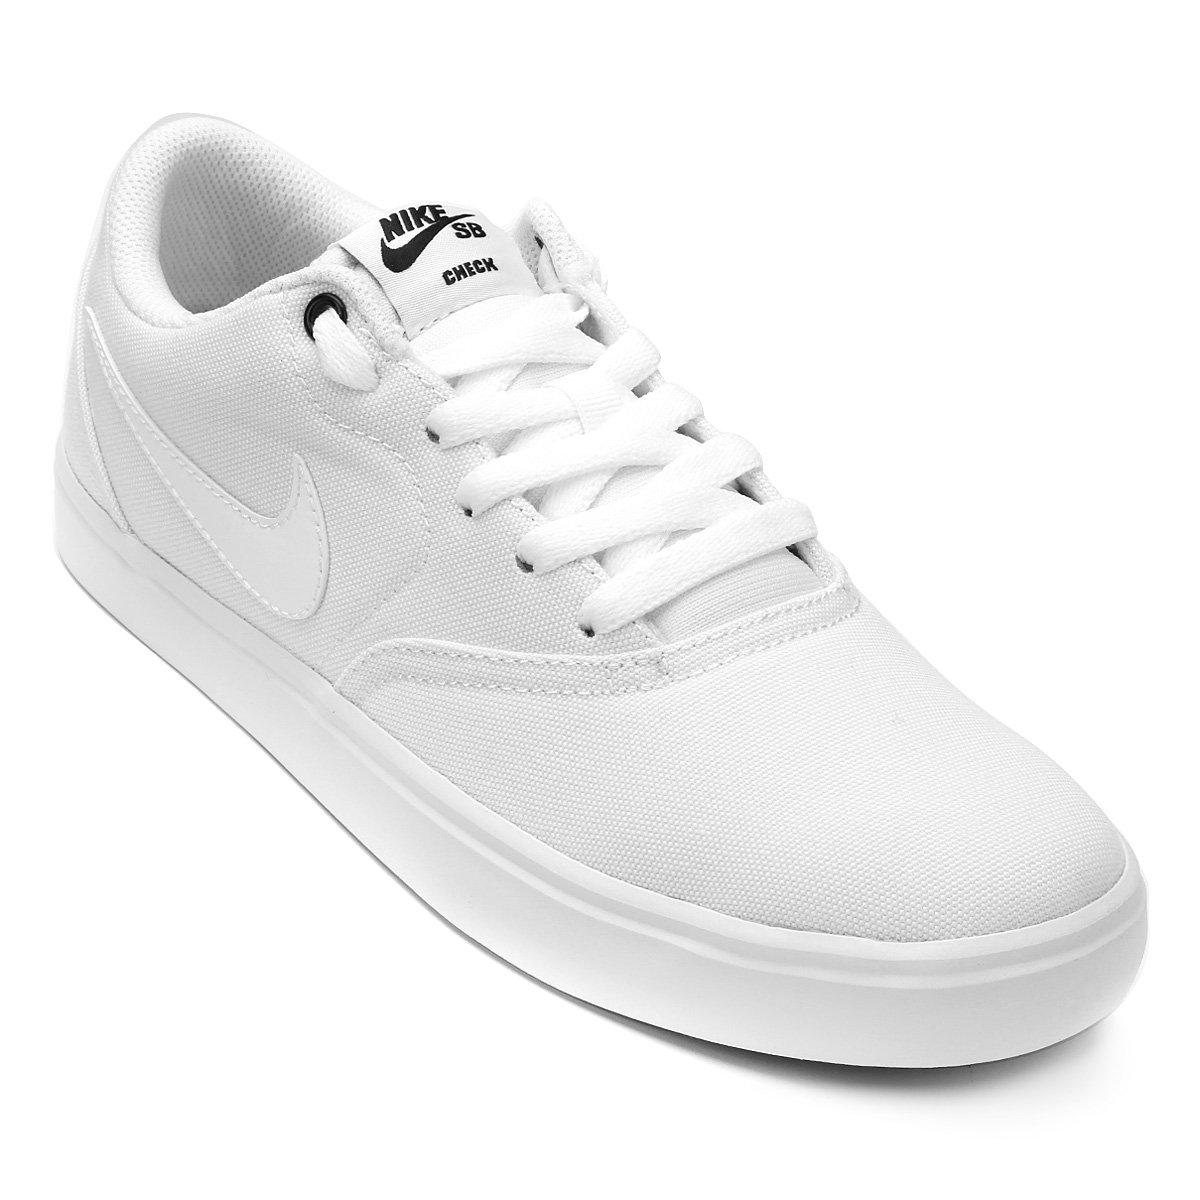 Tênis Nike Wmns Sb Check Solar Cnvs Feminino - Branco e Preto - Compre  Agora  8169eaa4f6e